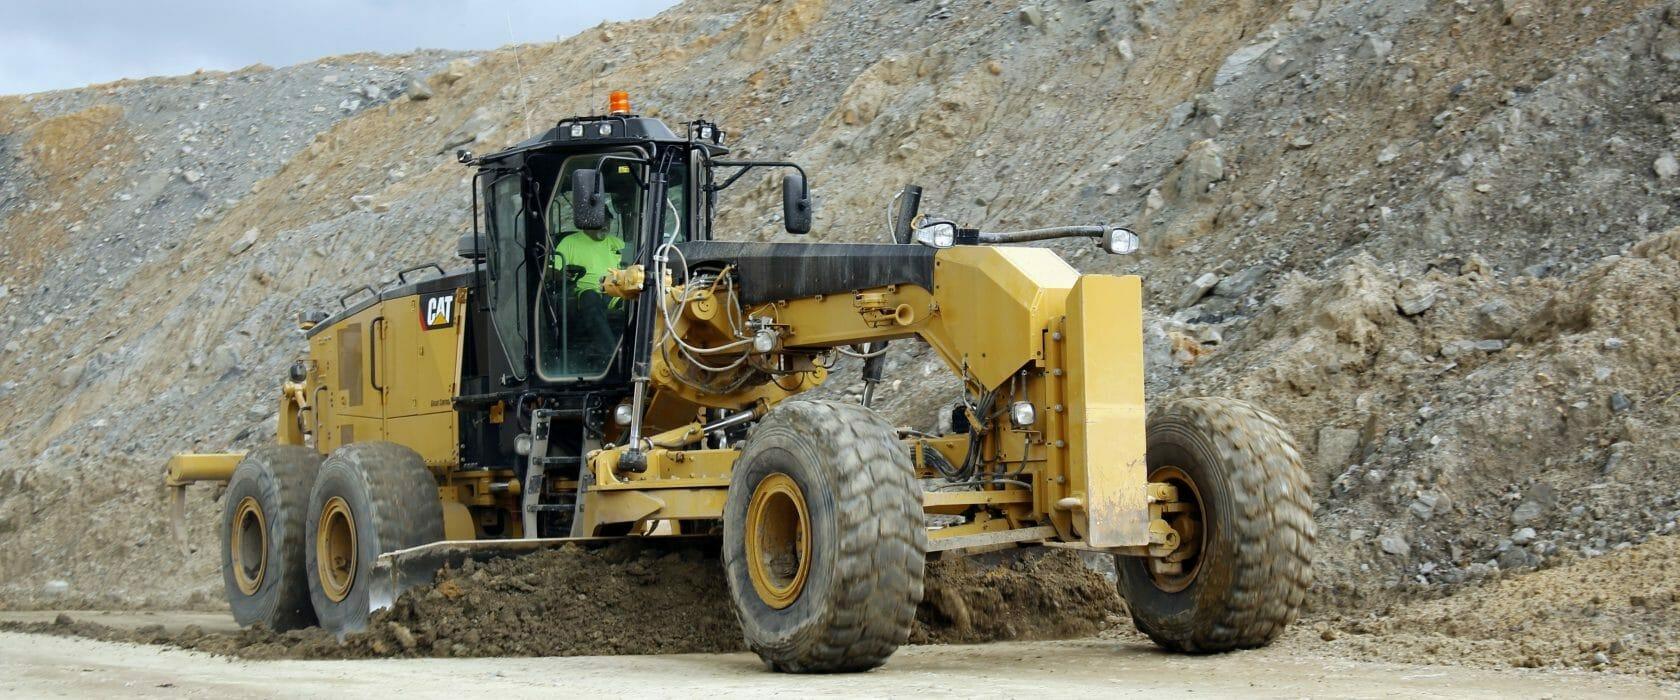 Equipment Moving Dirt